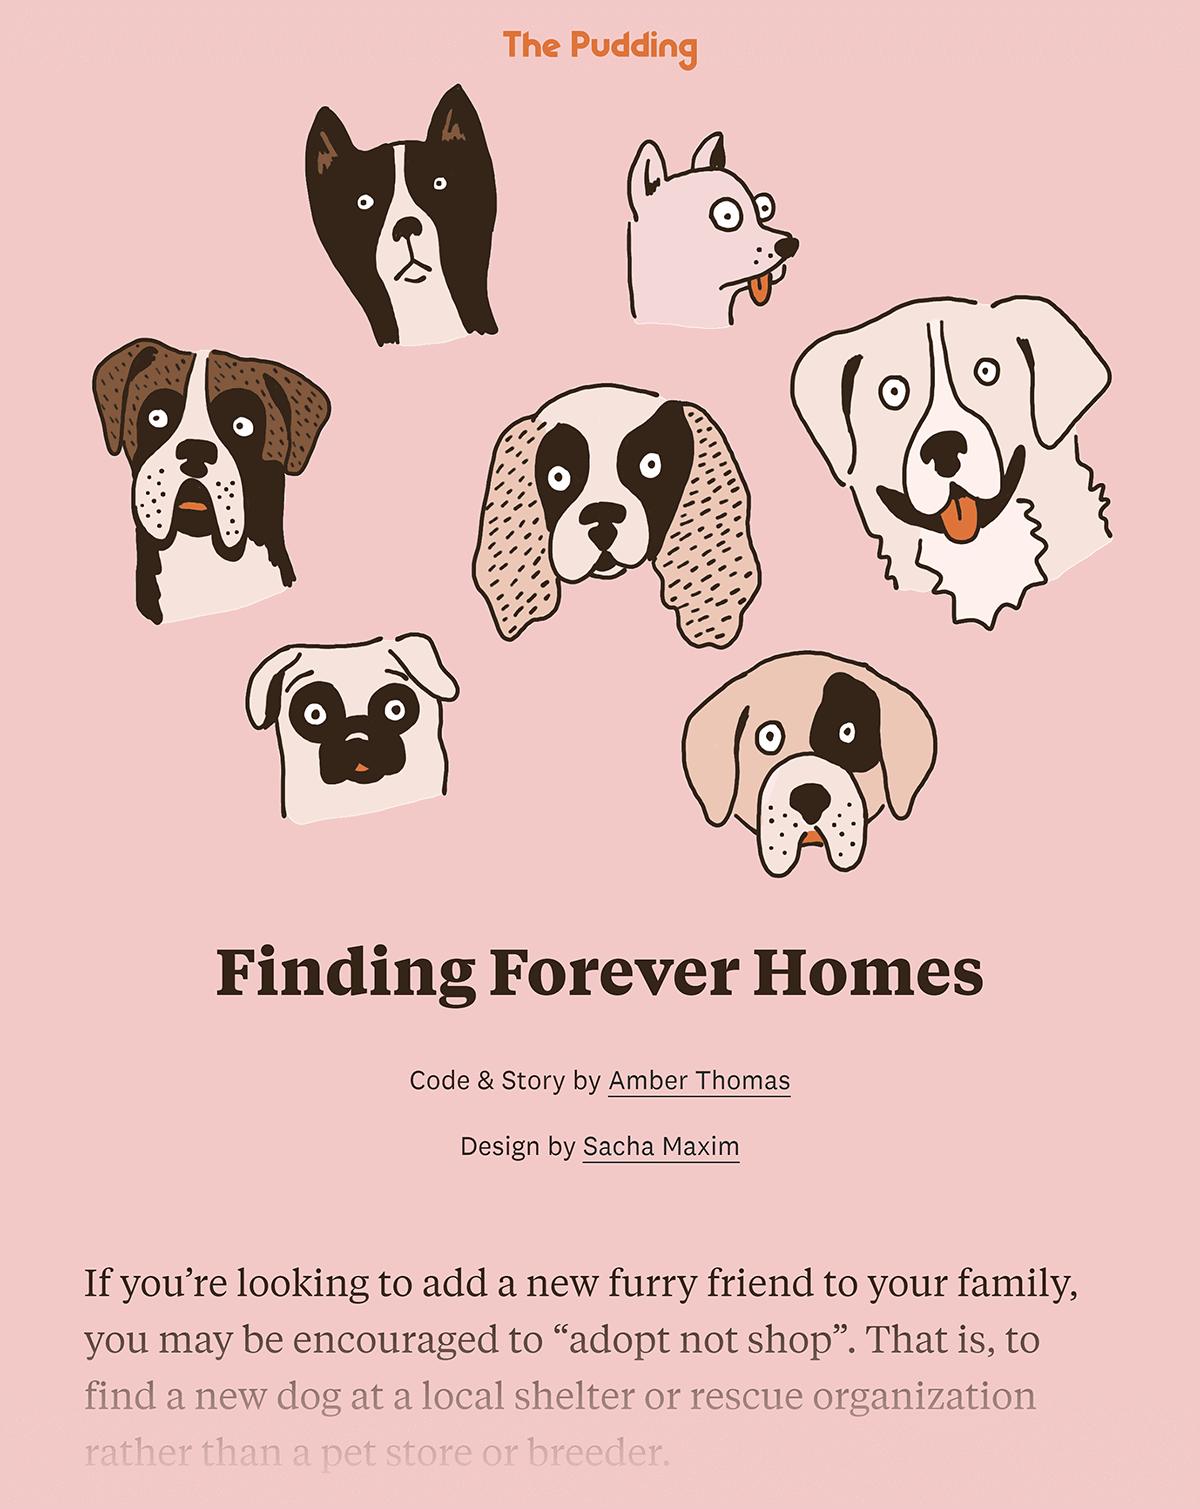 Pudding dog shelter report